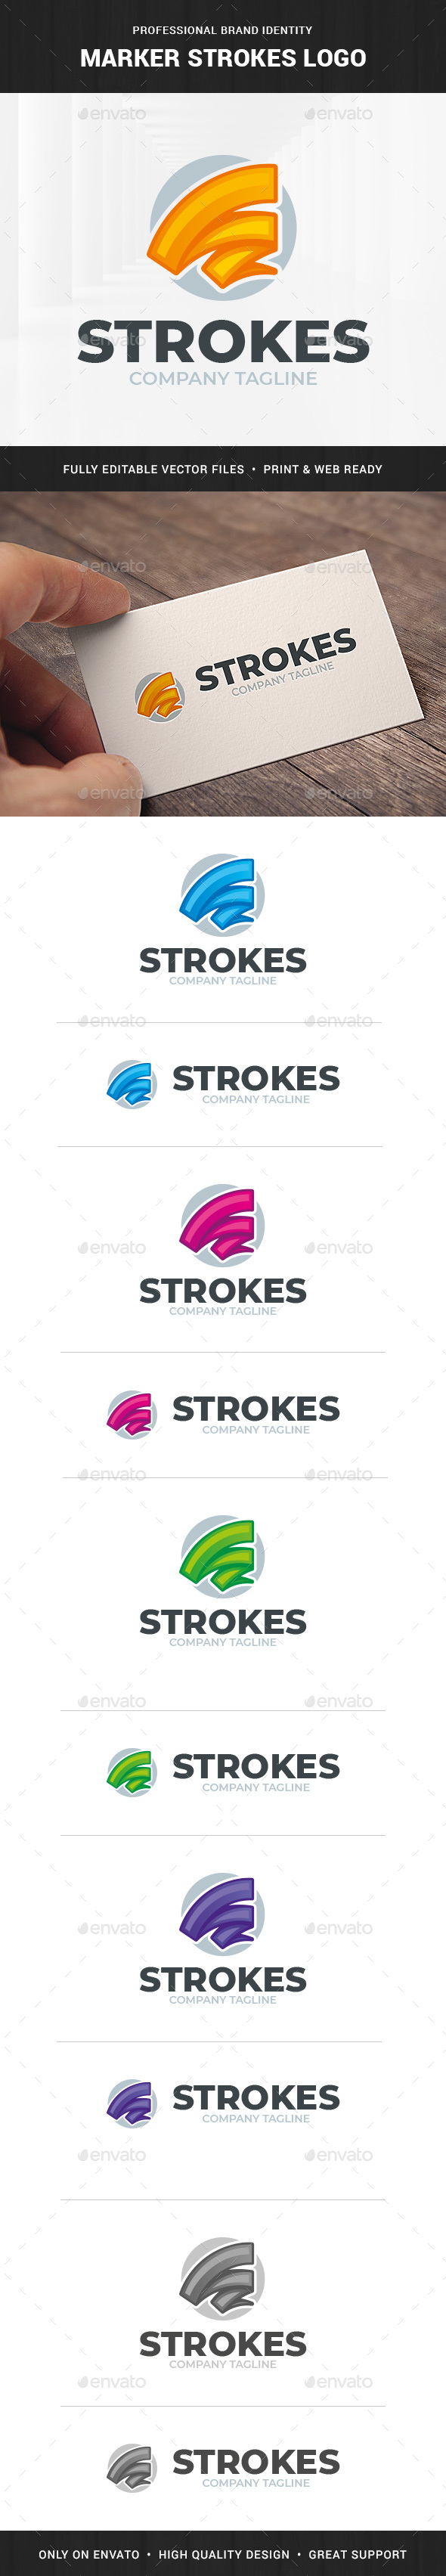 Marker Strokes Logo Template